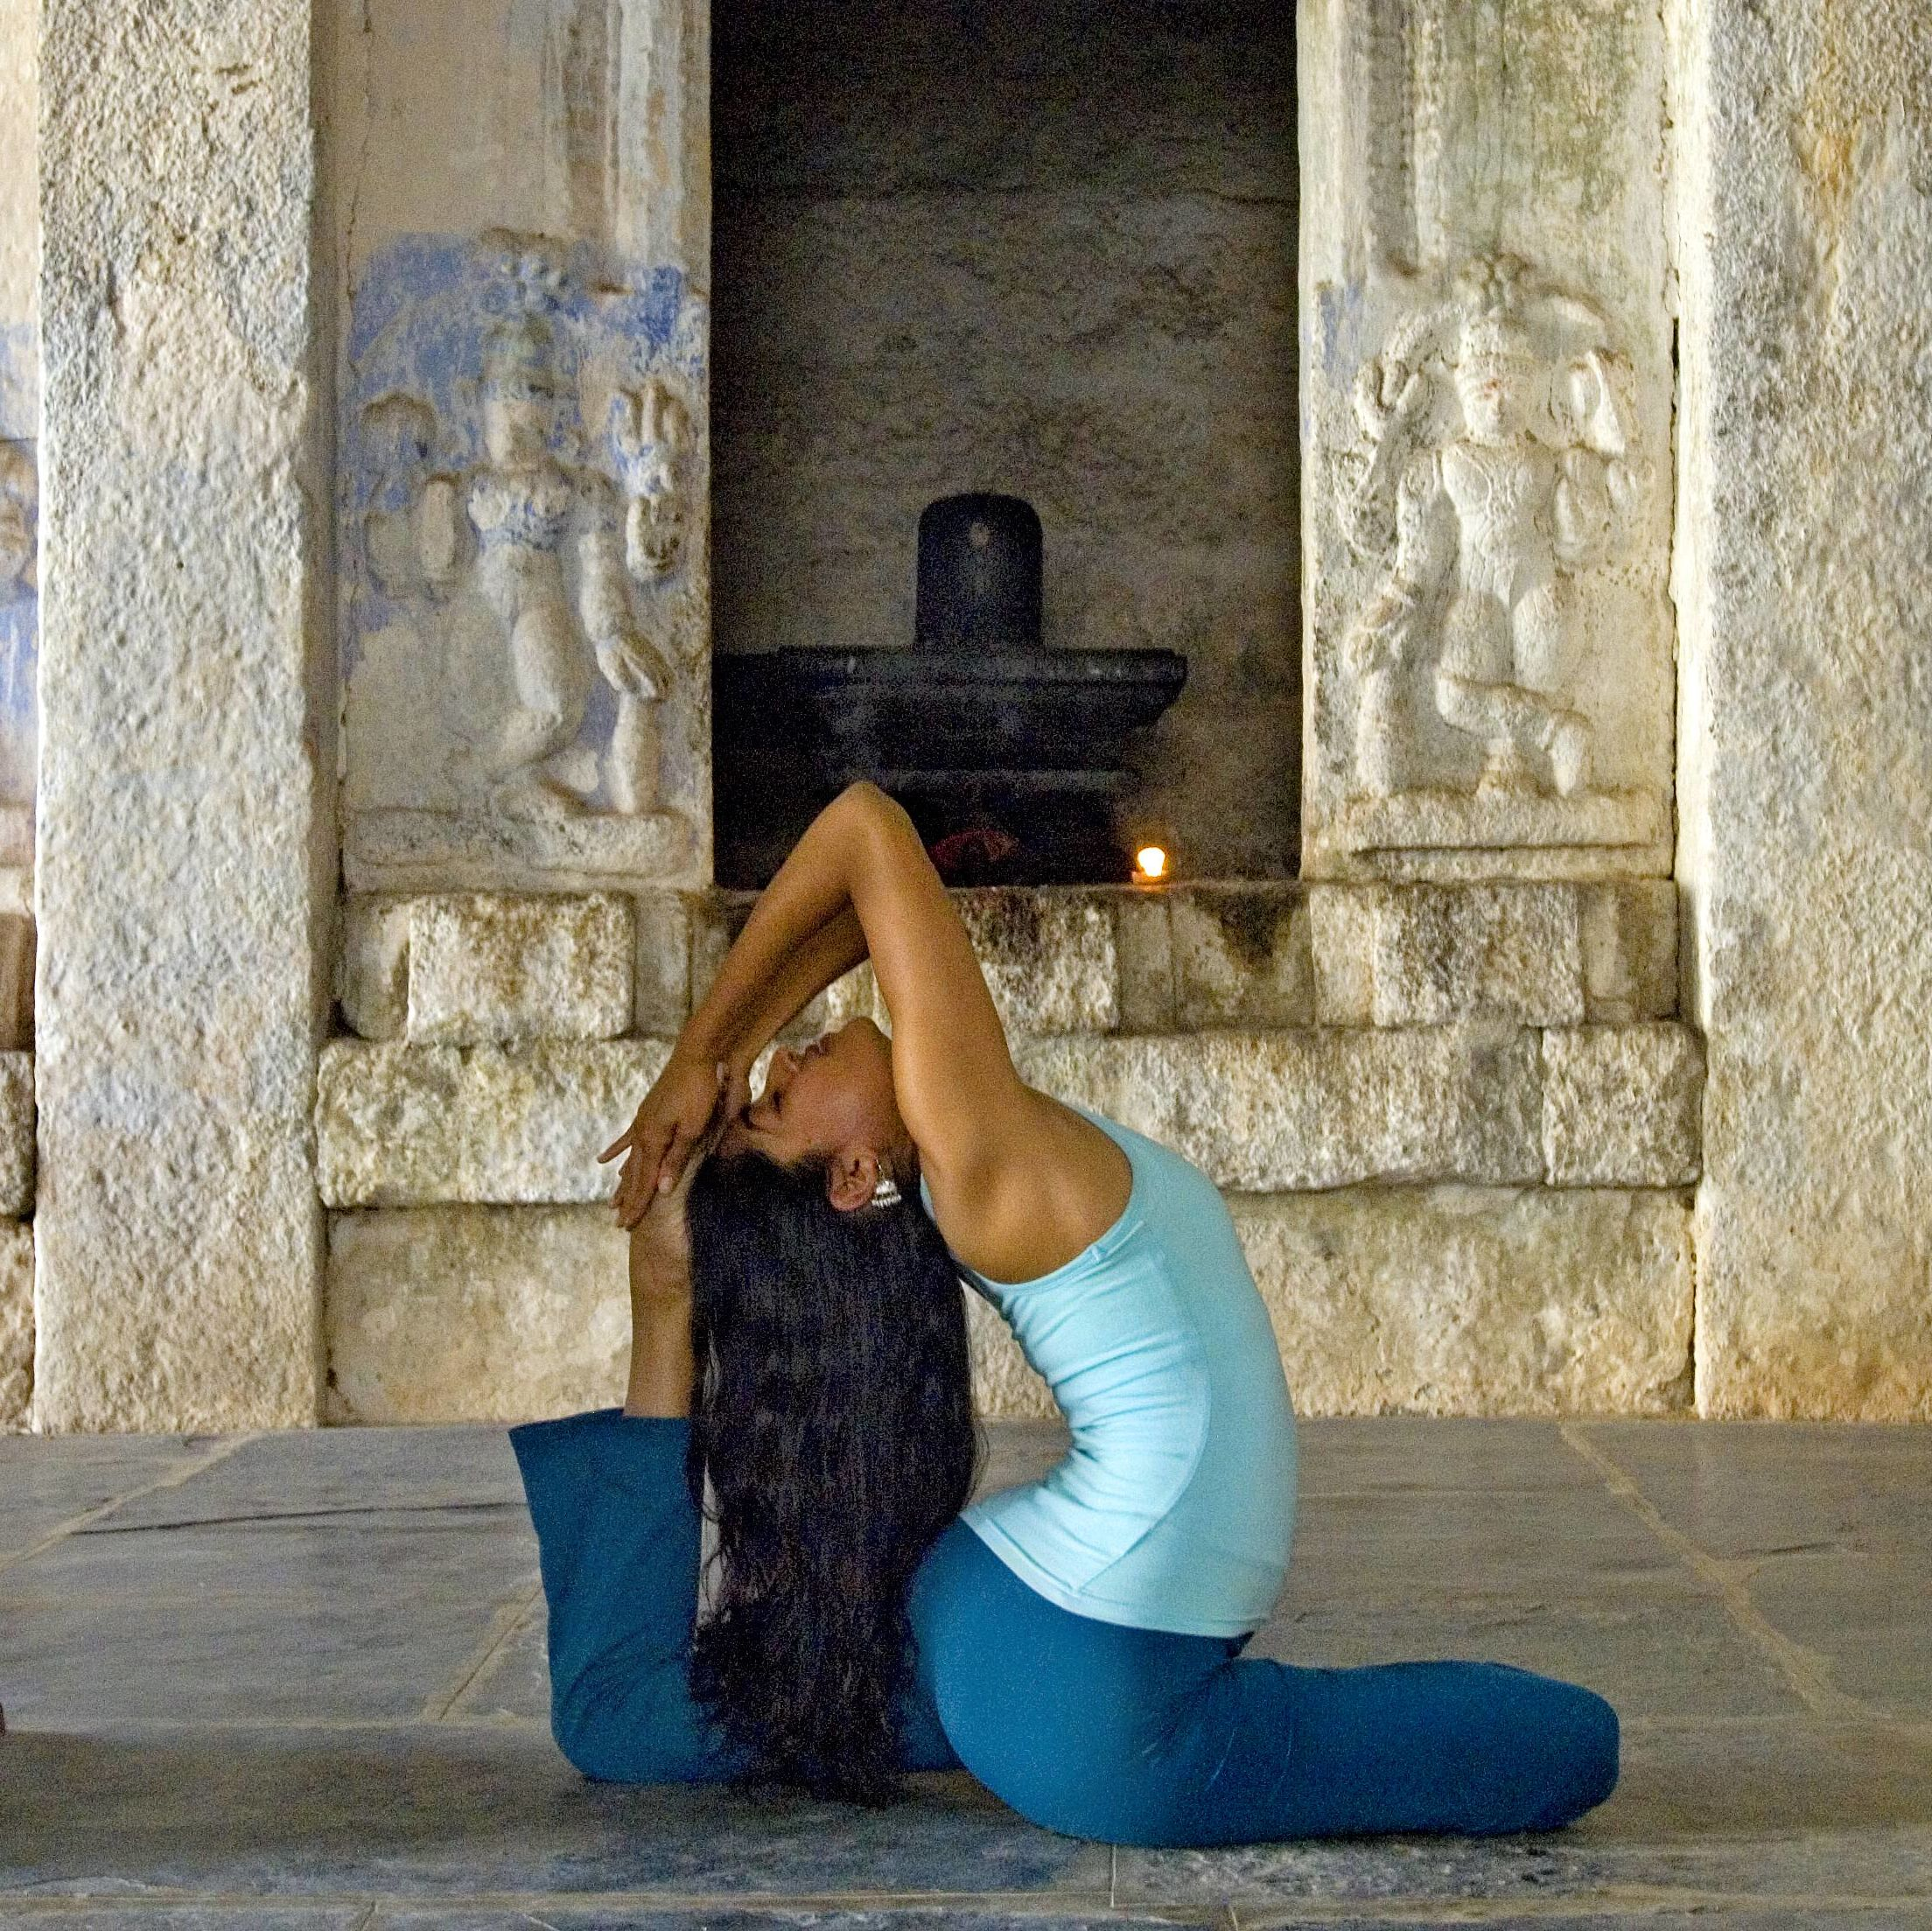 Reema datta  yoga for emotional healing event at pearl yoga 1  mzowzh